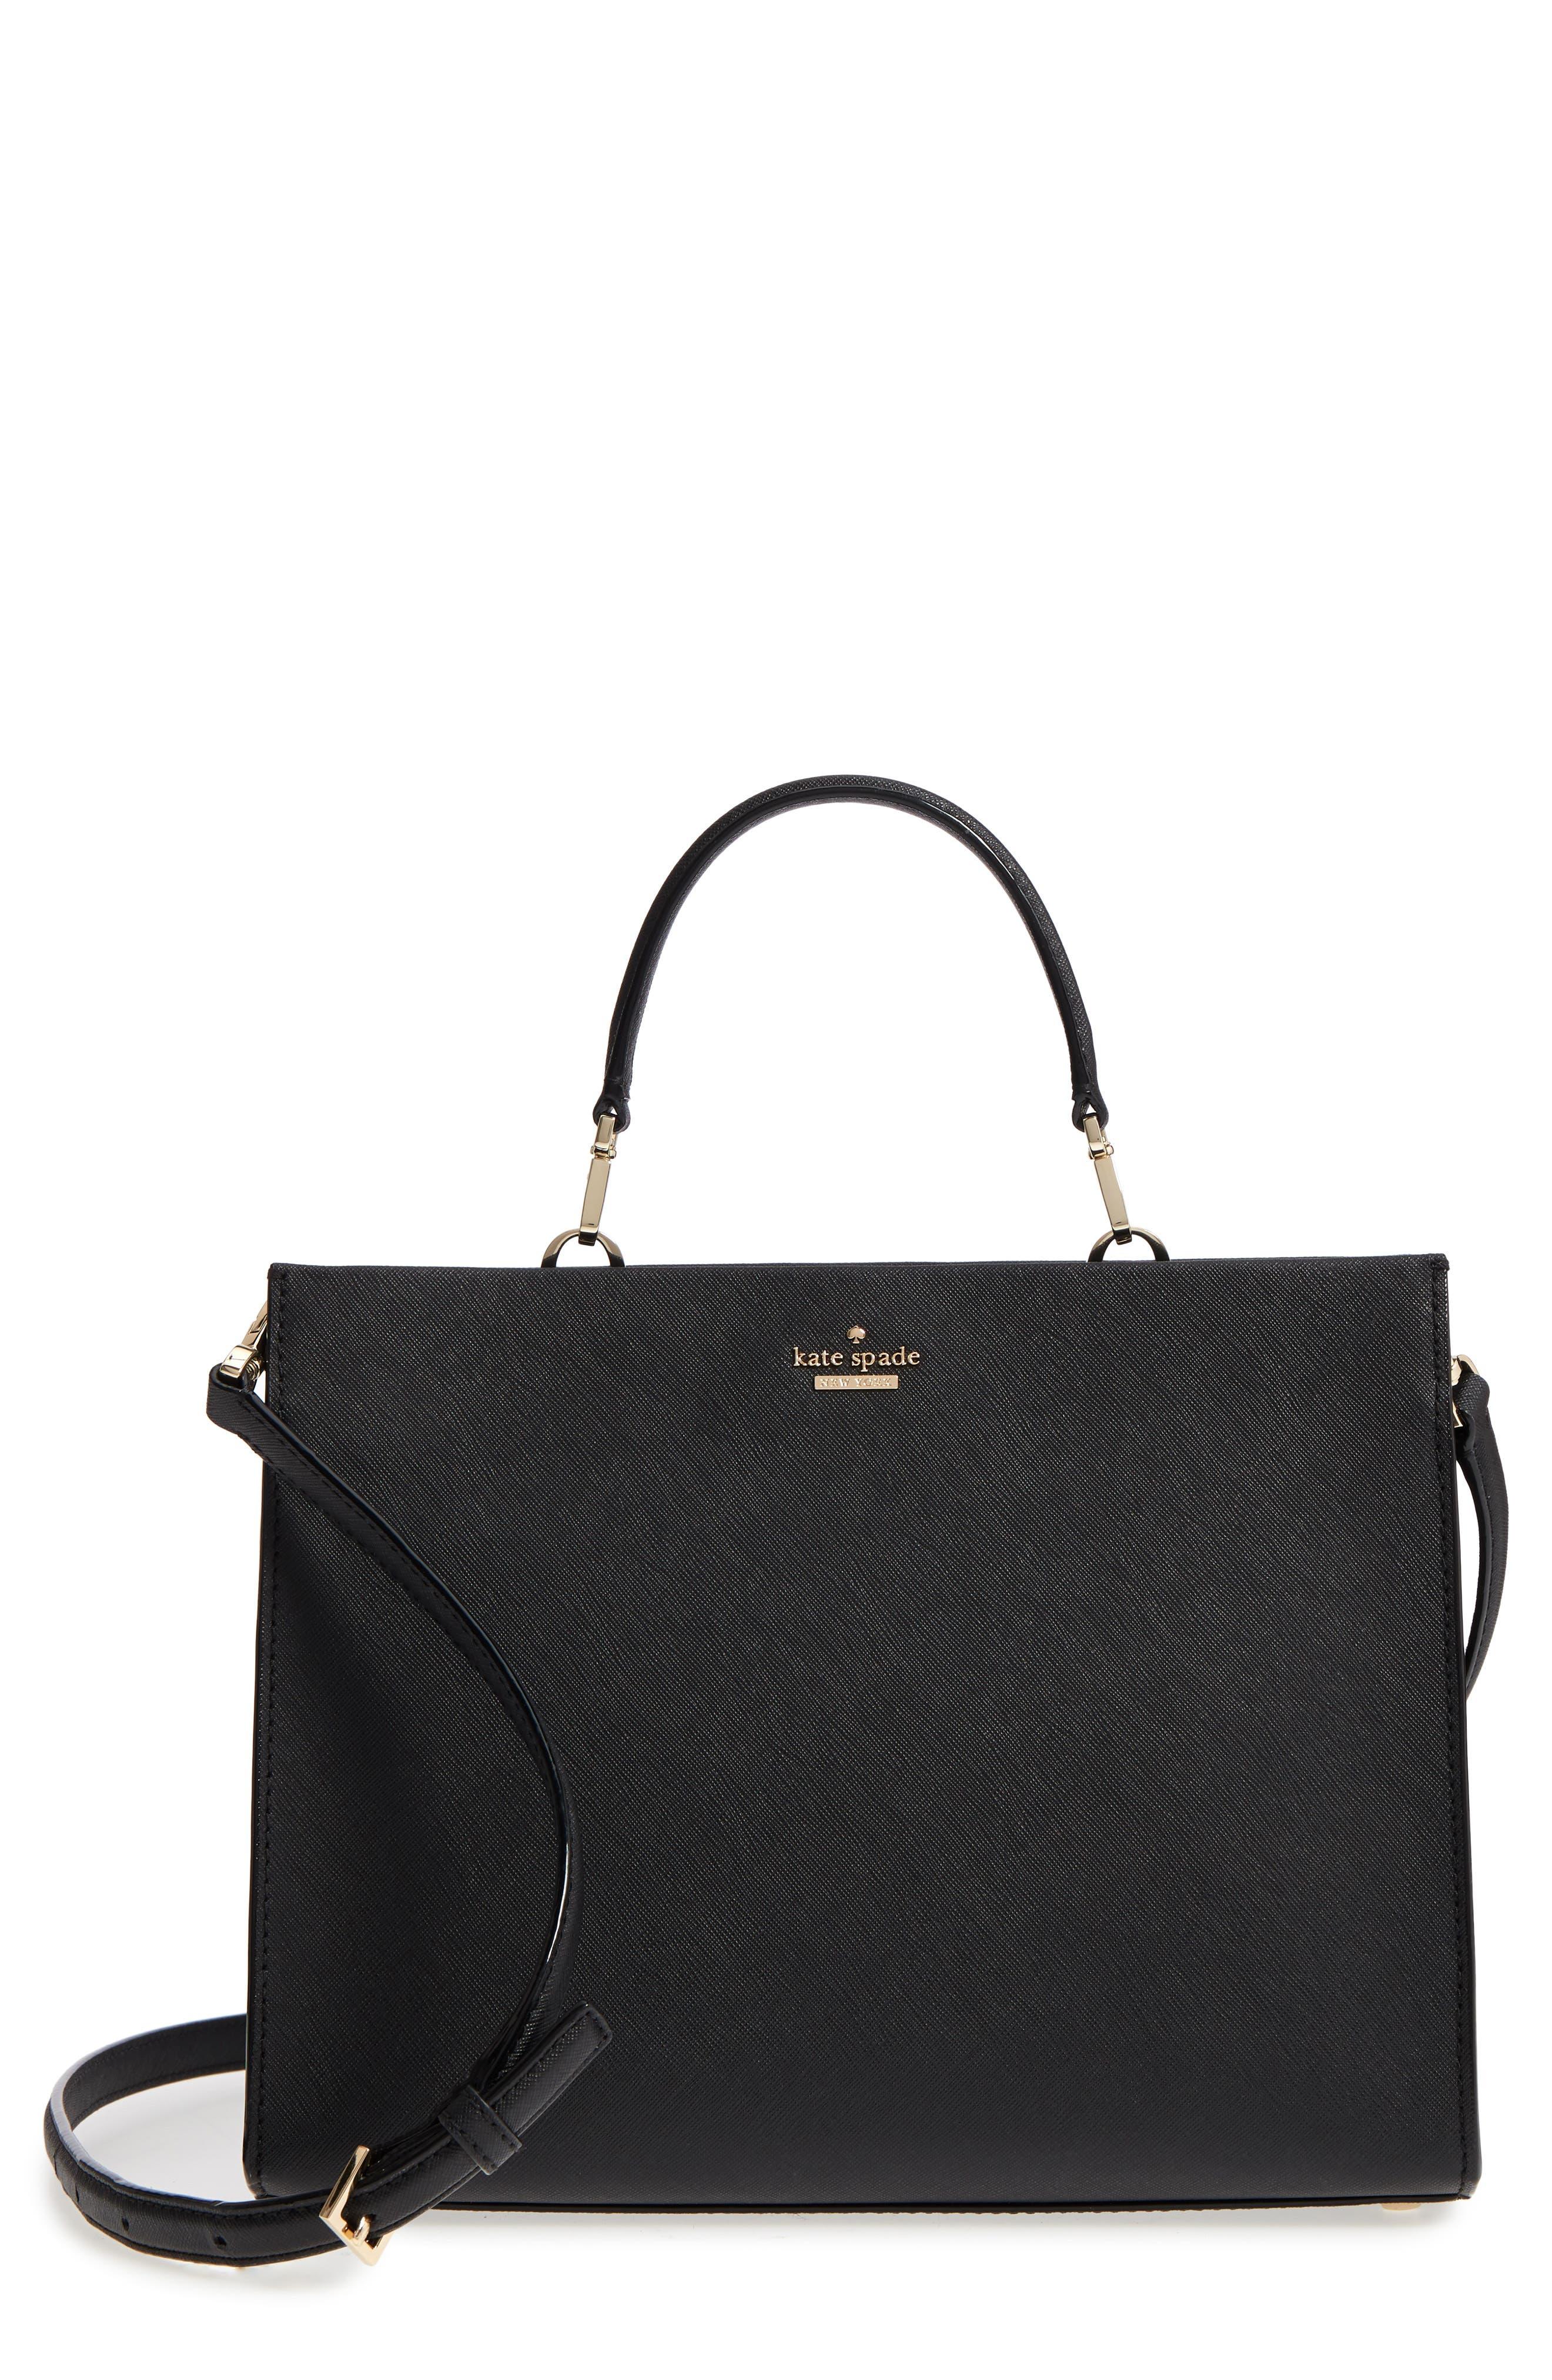 kate spade new york cameron street - sara leather satchel